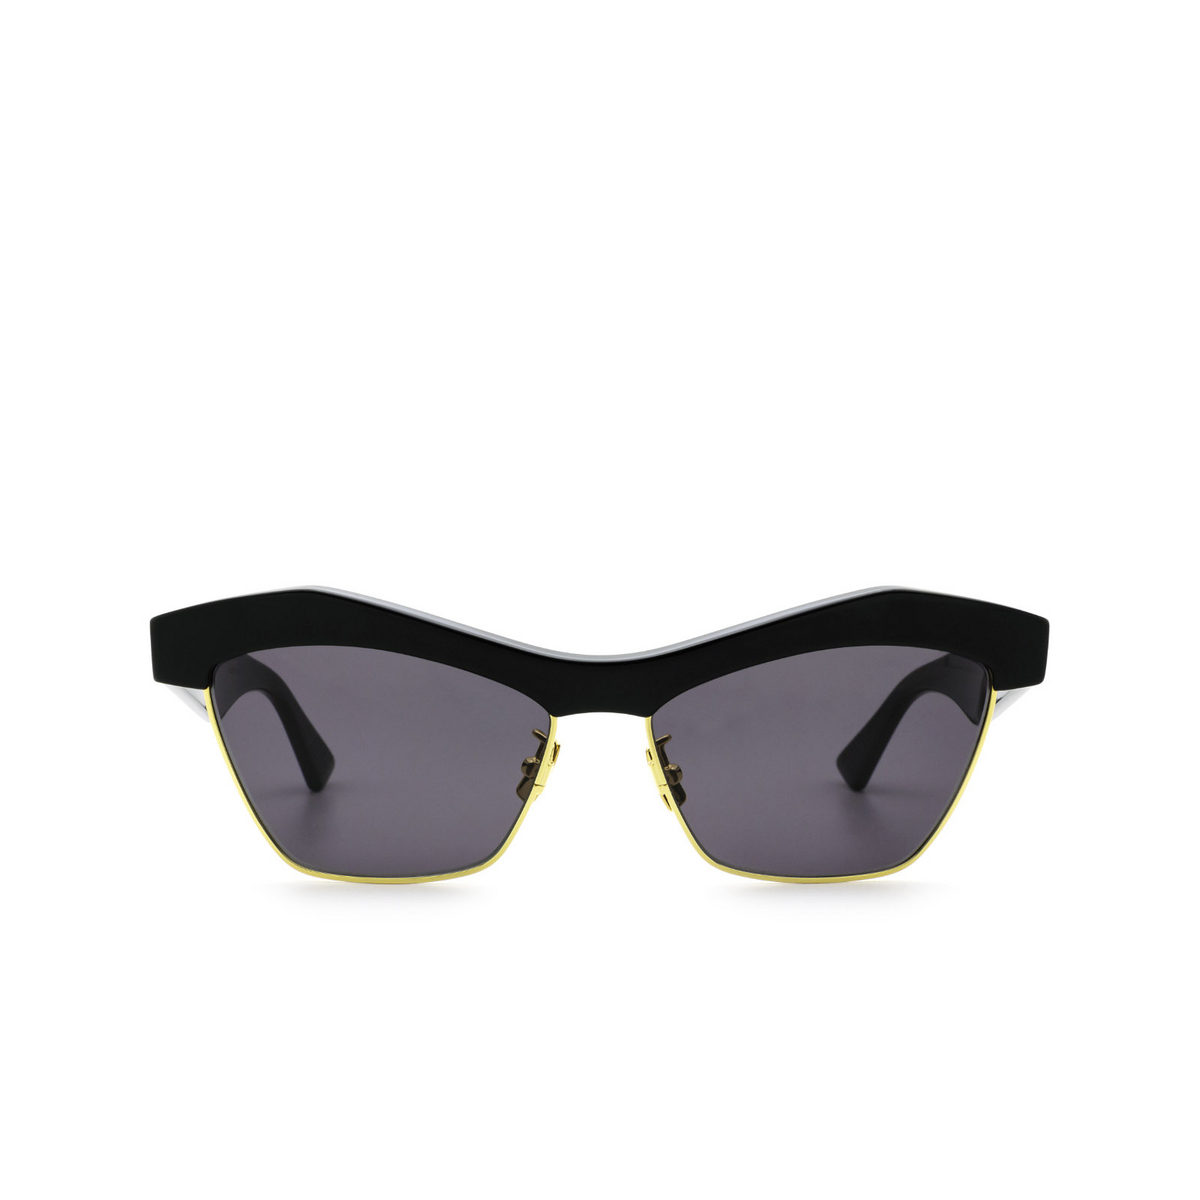 Bottega Veneta® Irregular Sunglasses: BV1099S color Black 001 - front view.